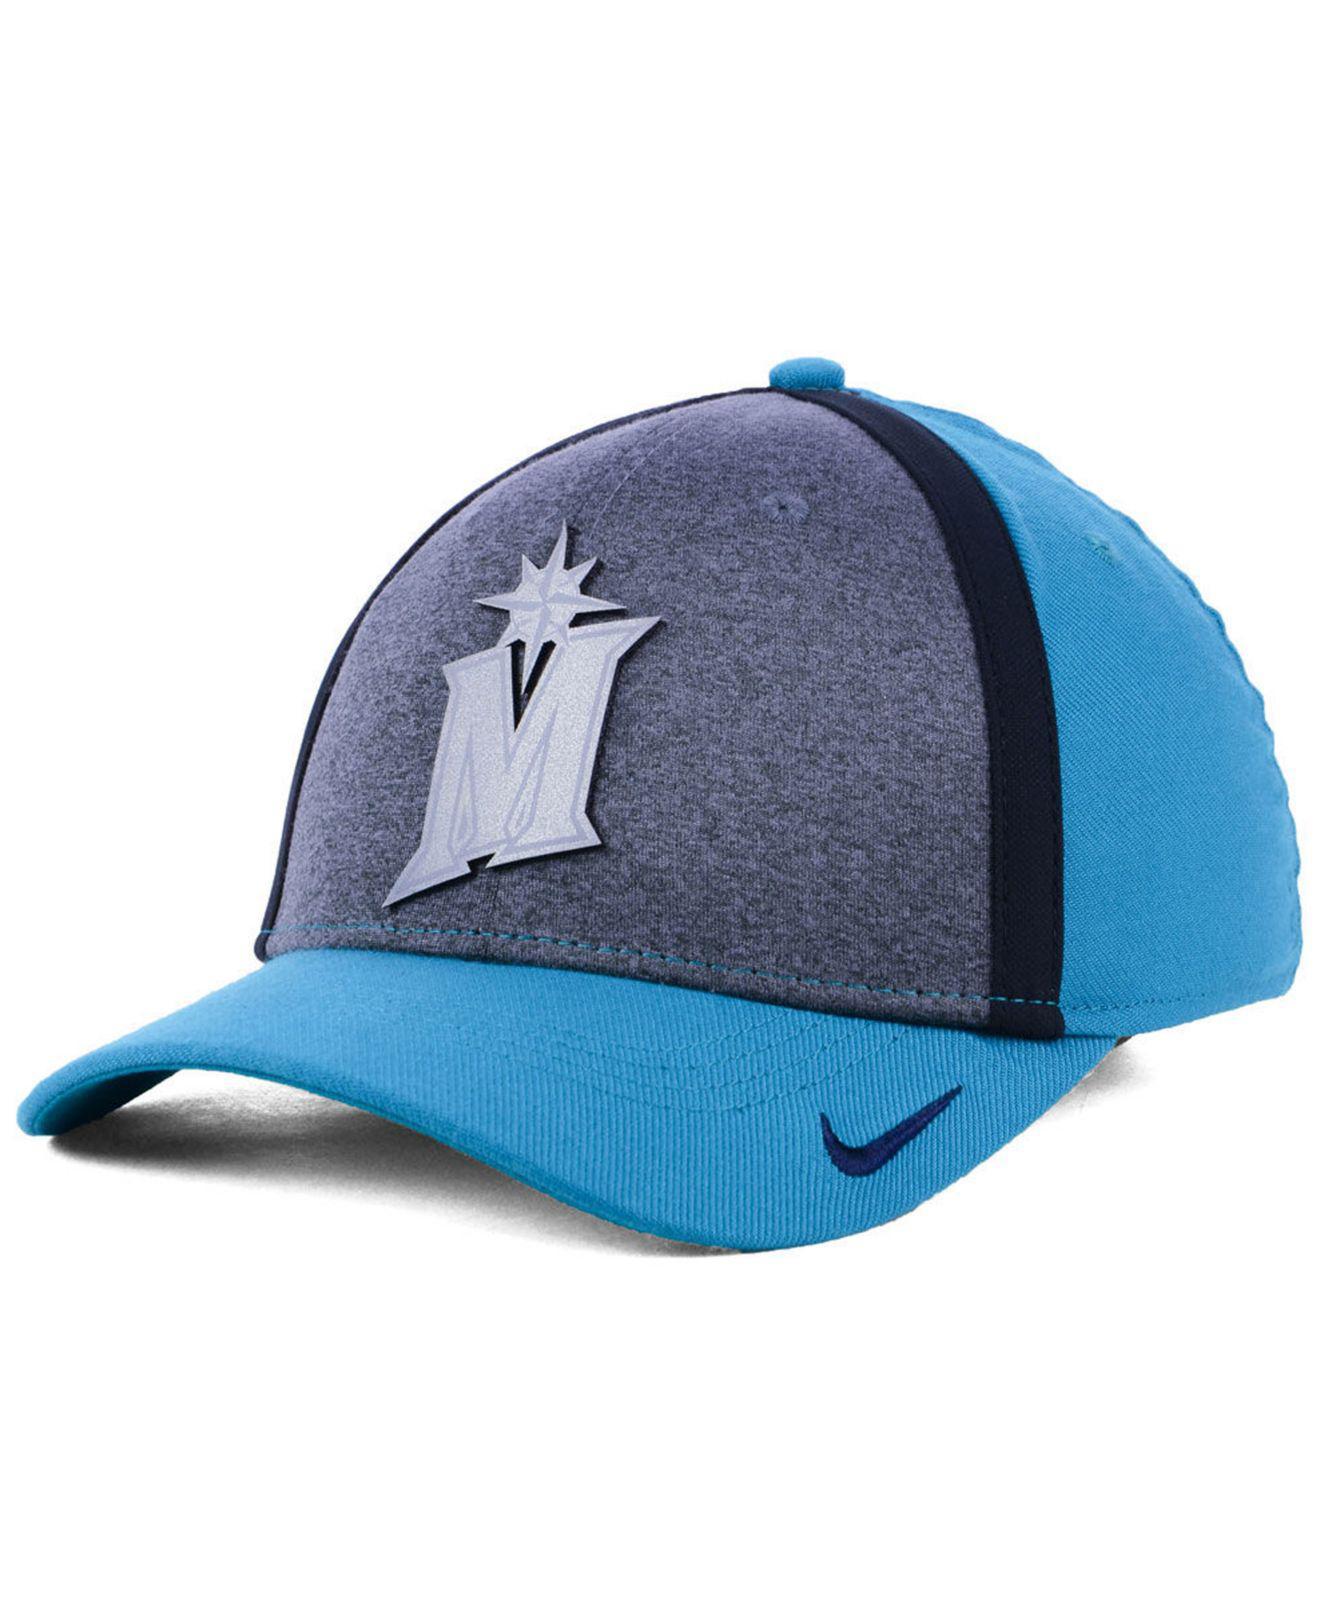 e2539d93 ... low price nike. mens blue seattle mariners team color reflective  swooshflex cap c2895 10350